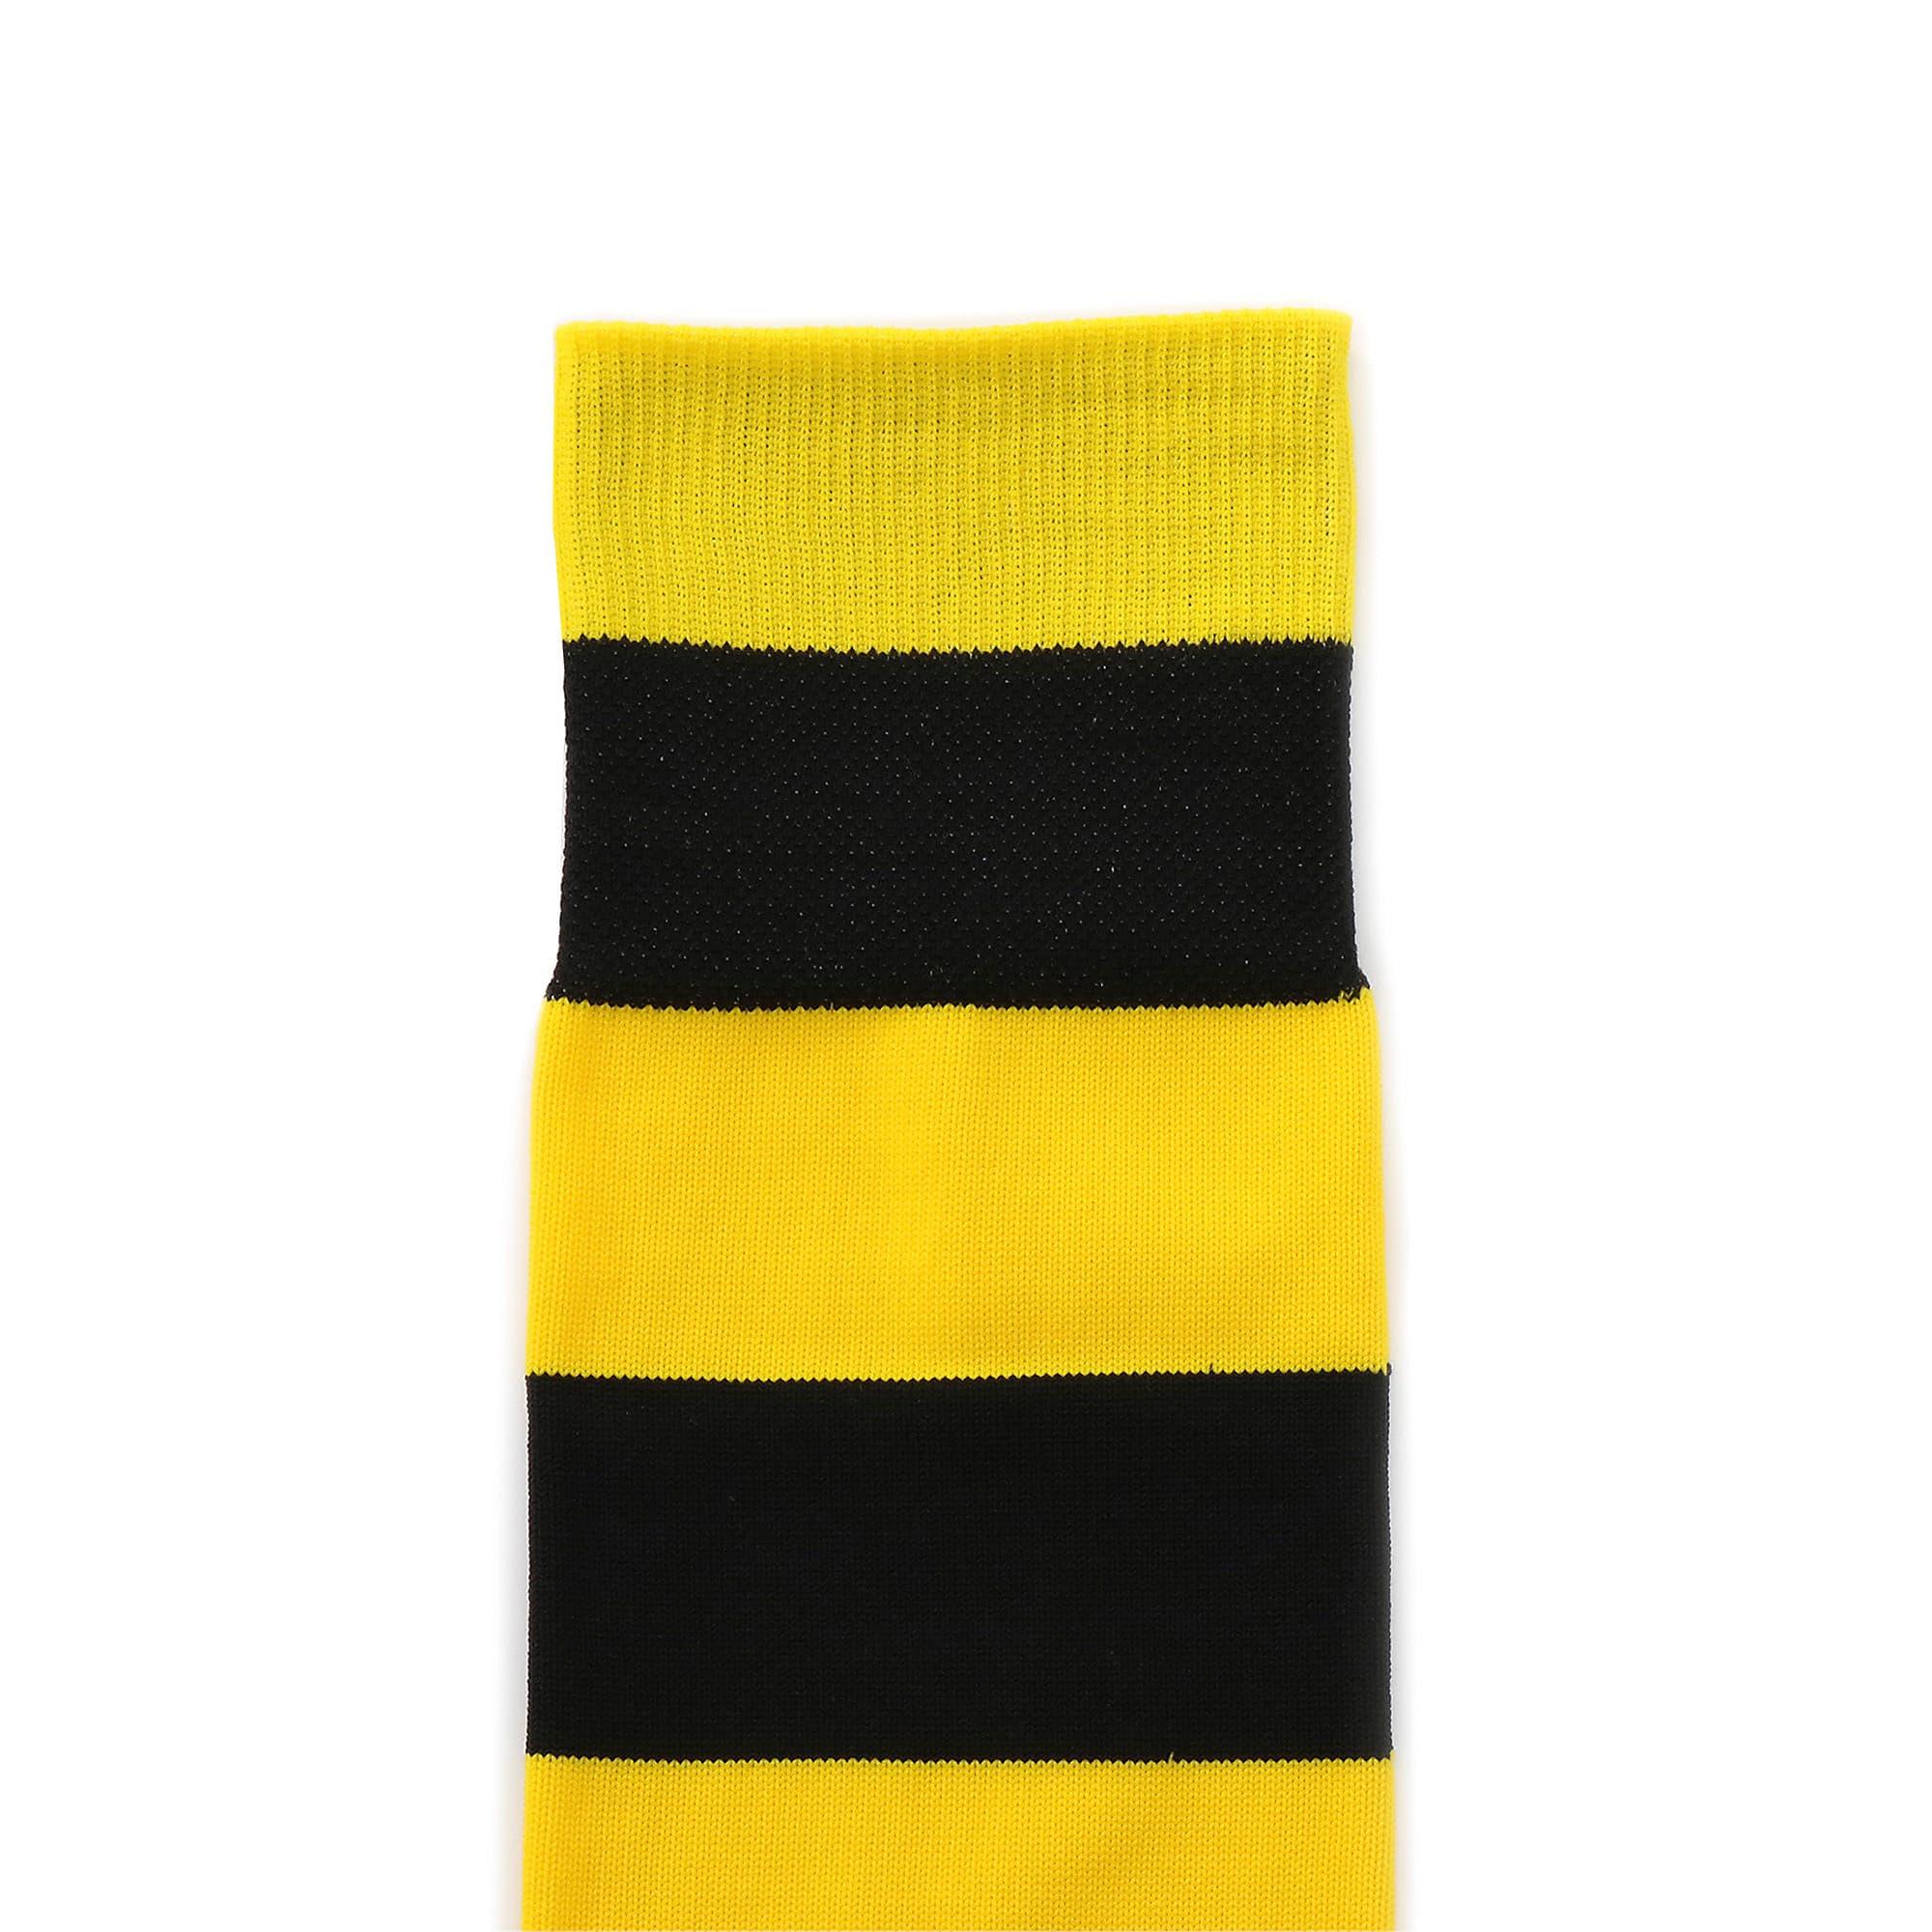 Thumbnail 3 of BVB フープド ストッキング, Cyber Yellow-Puma Black, medium-JPN